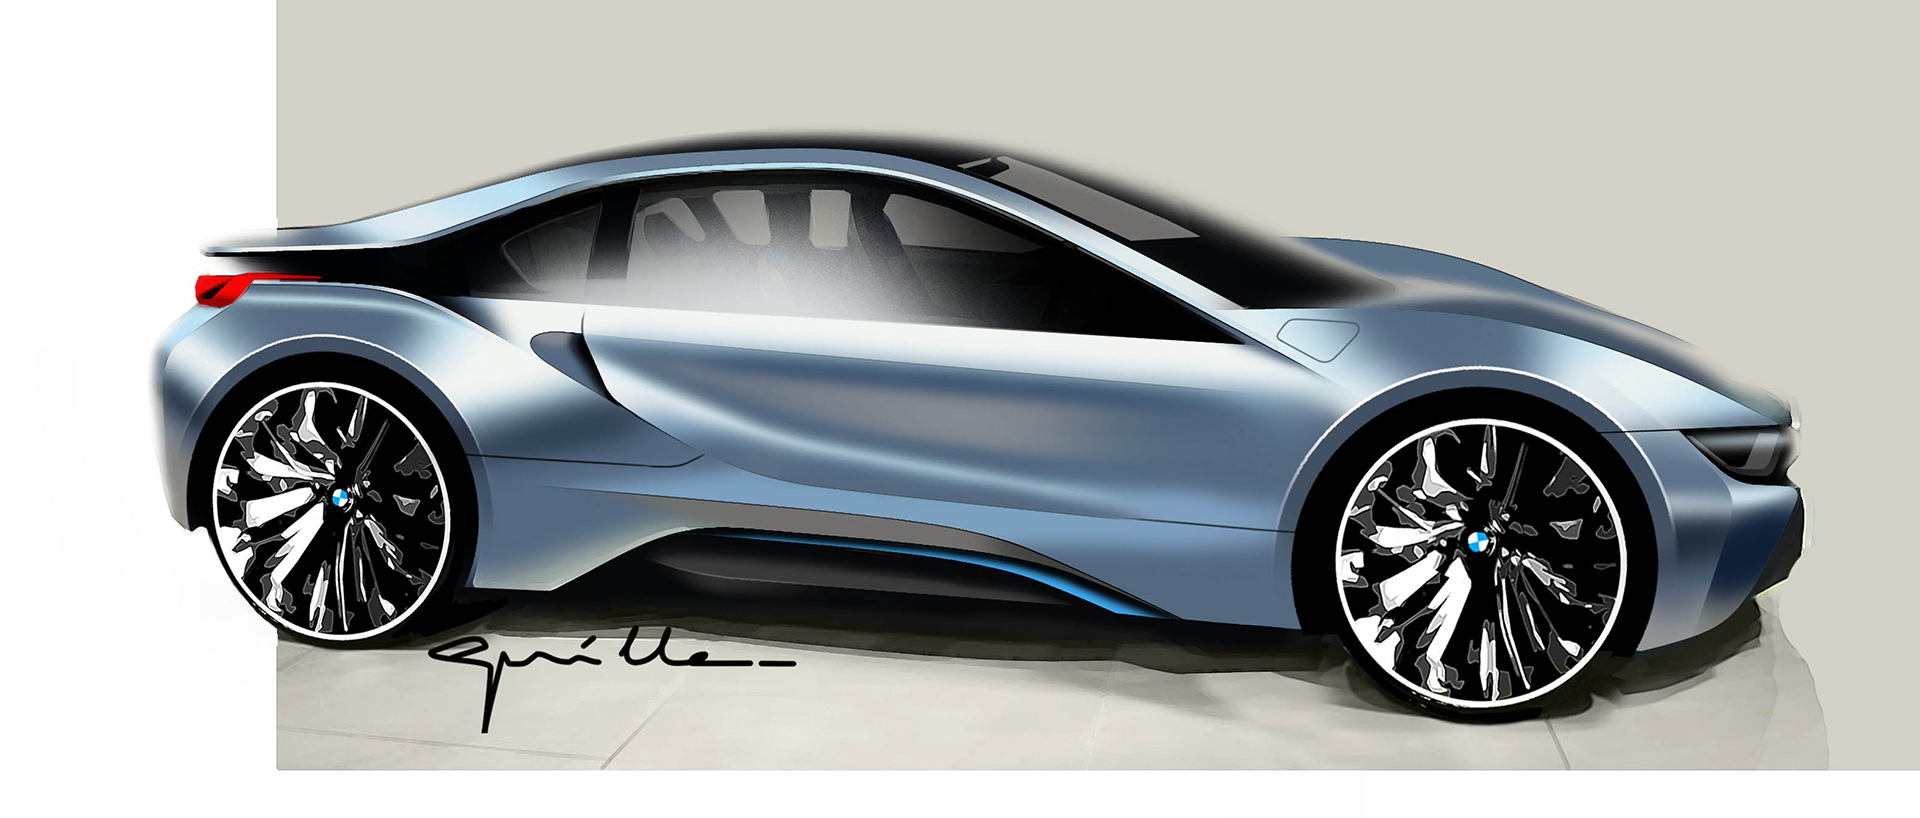 BMW i8 - sketch - exterior / extérieur